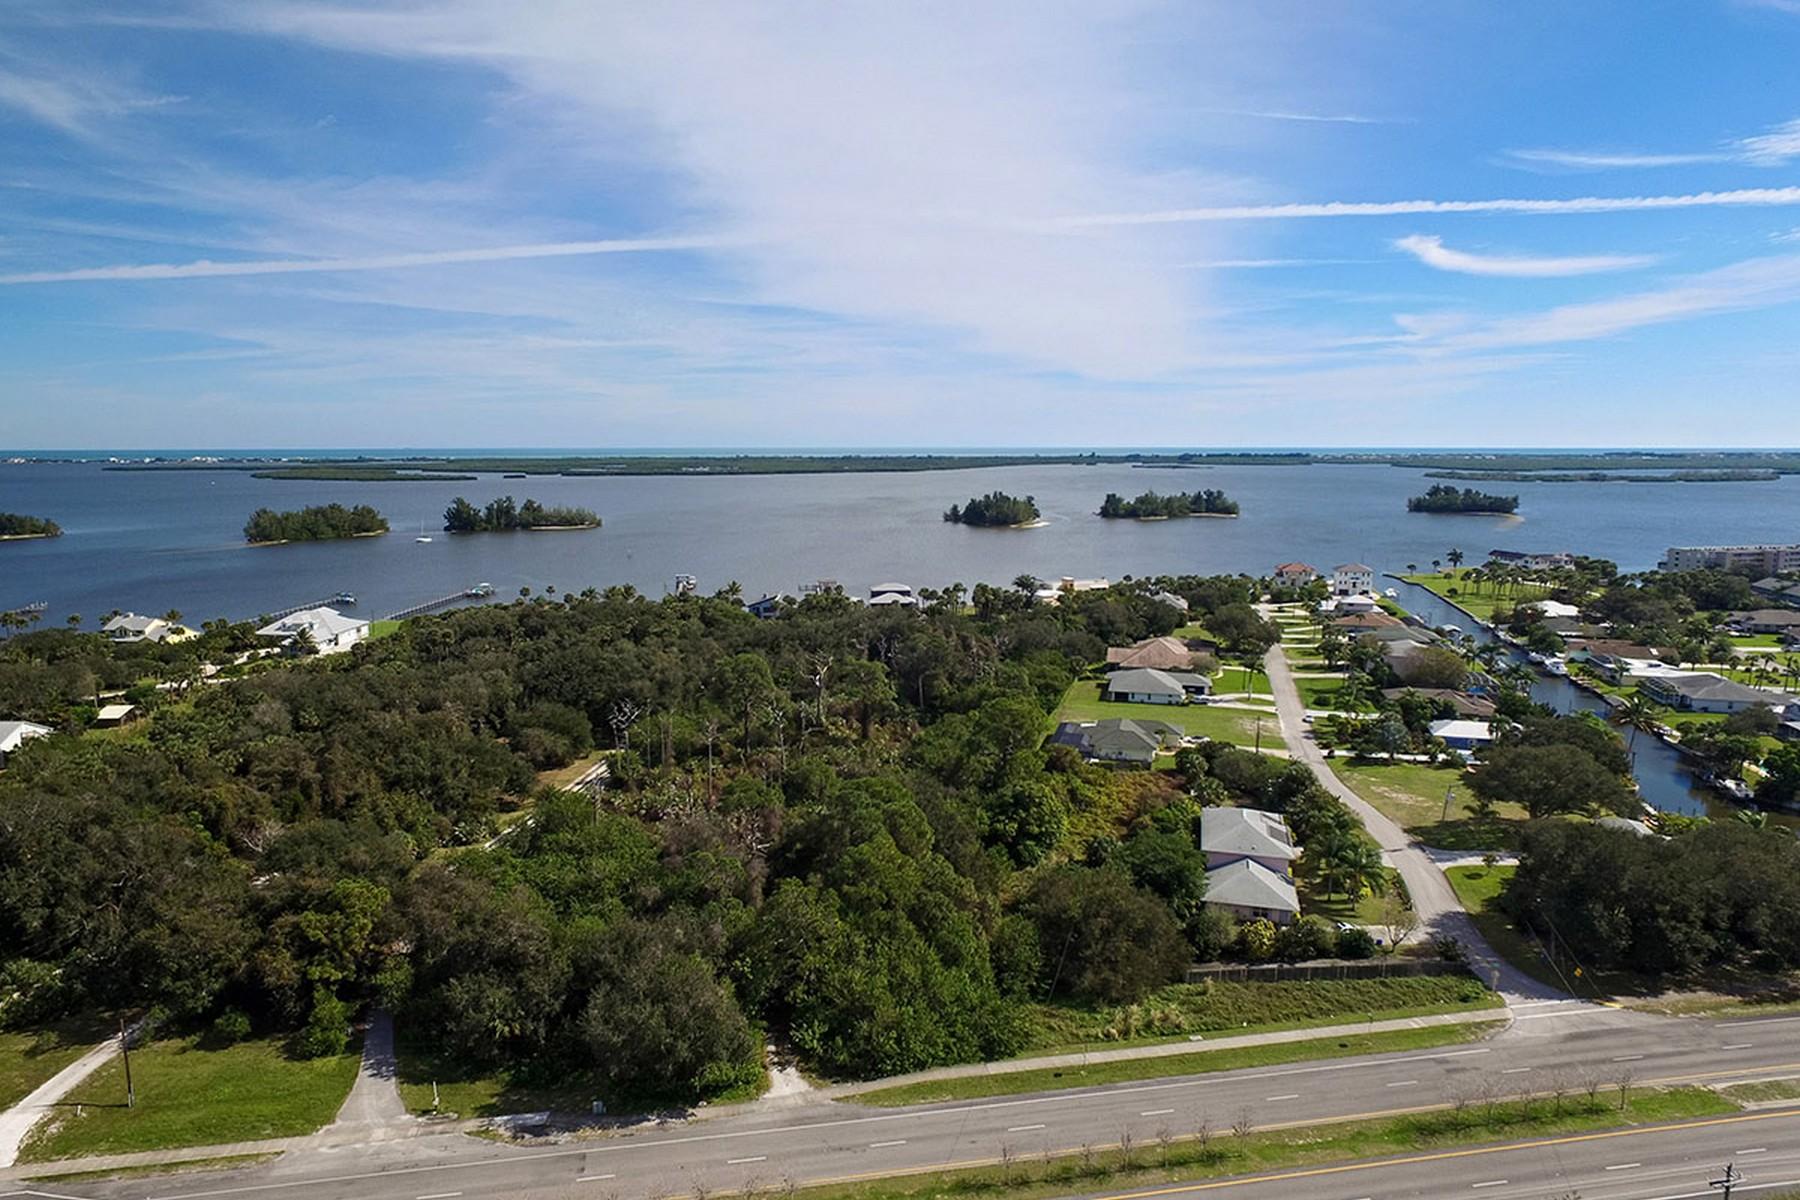 Terreno para Venda às Triplex Development Opportunity in Sebastian 11100 US Highway 1 Sebastian, Florida, 32958 Estados Unidos